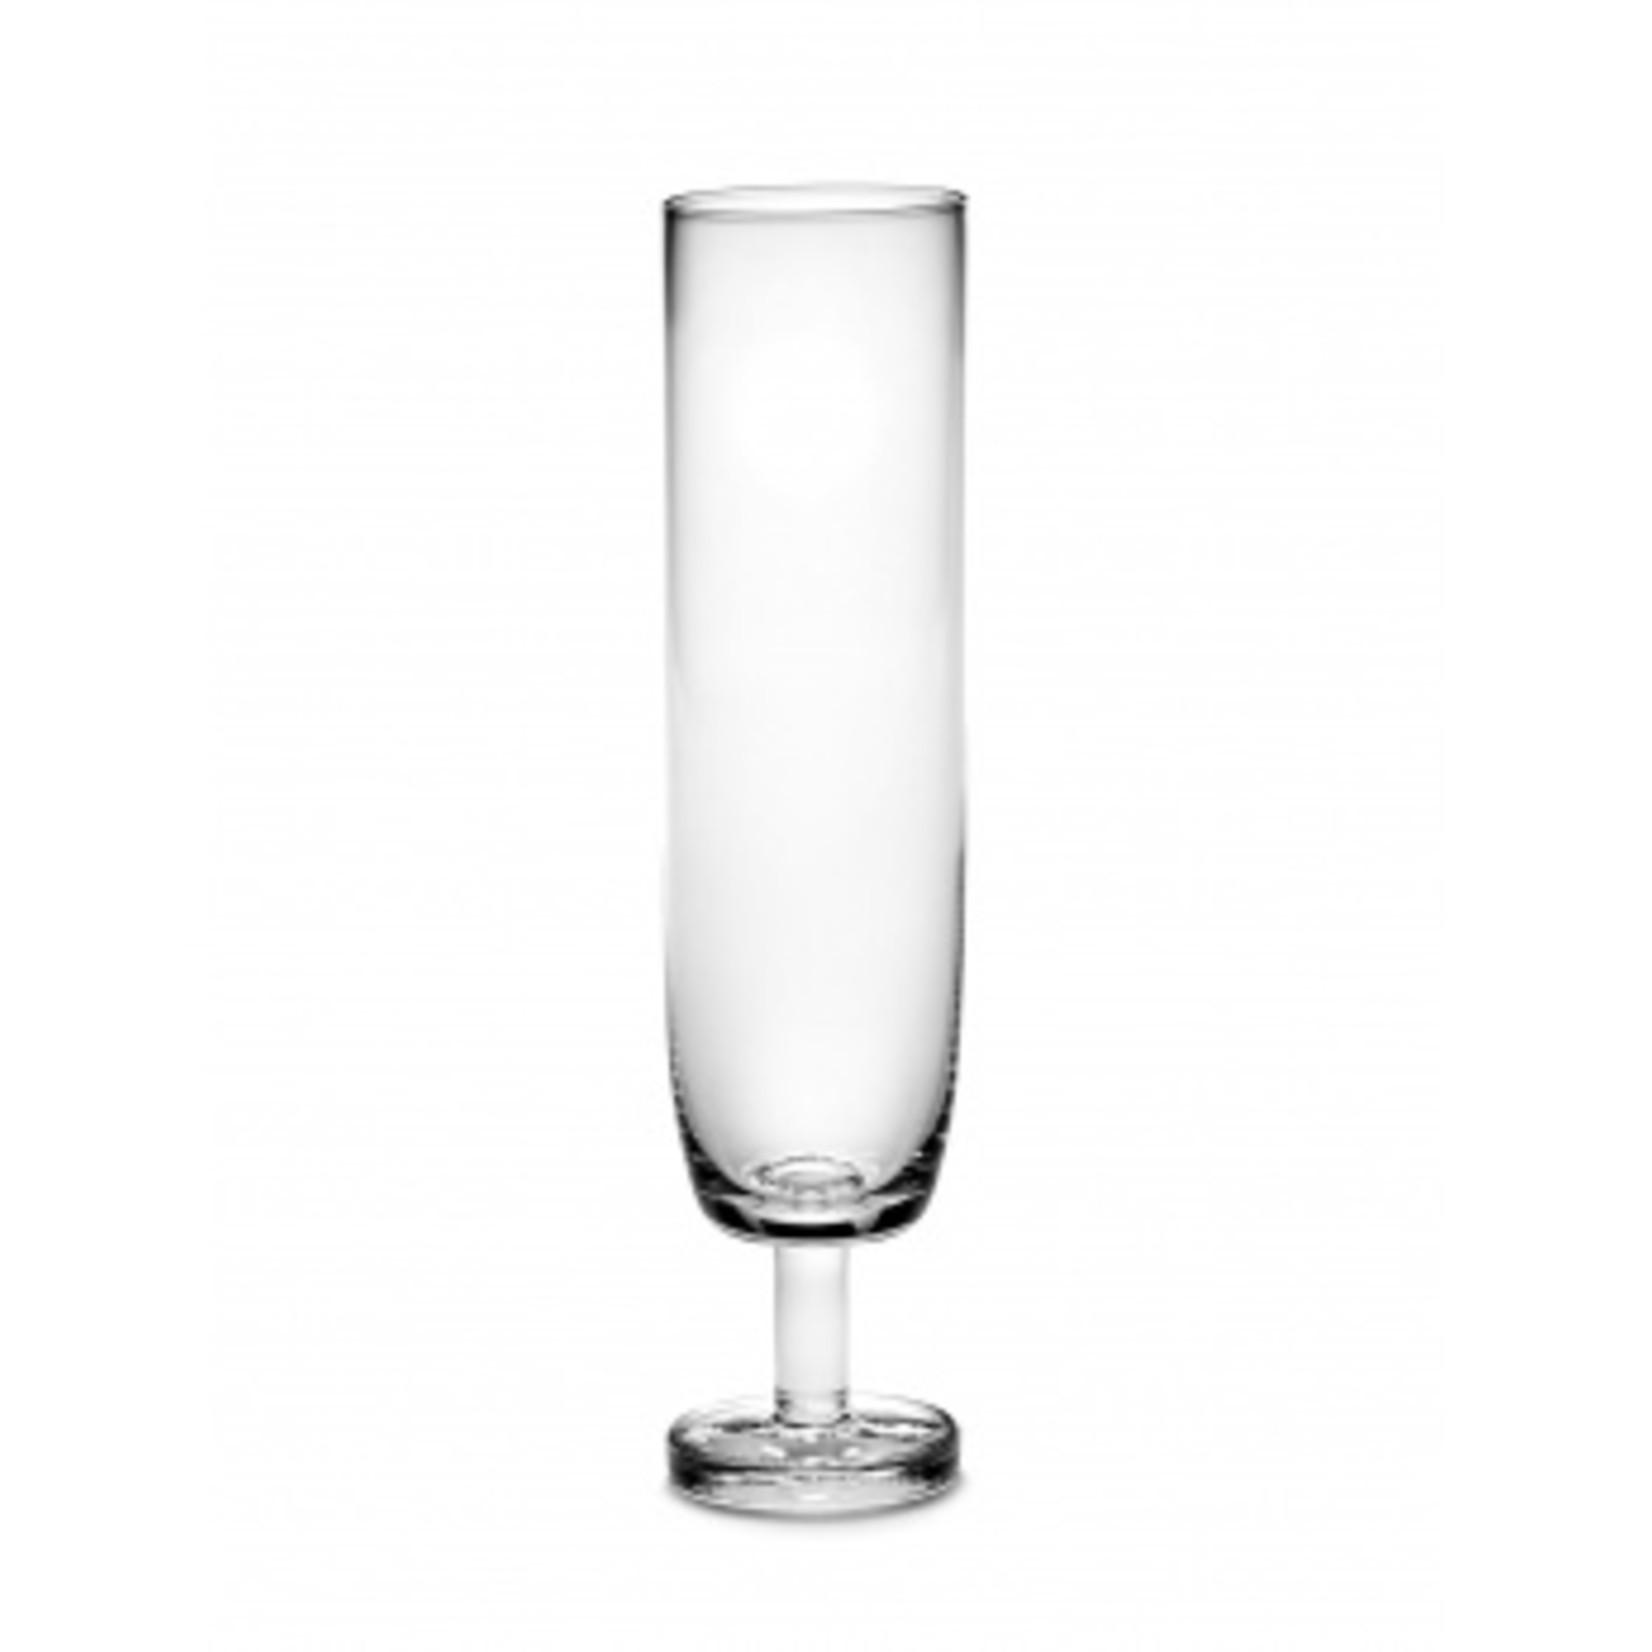 Piet Boon Champagneglas Piet Boon